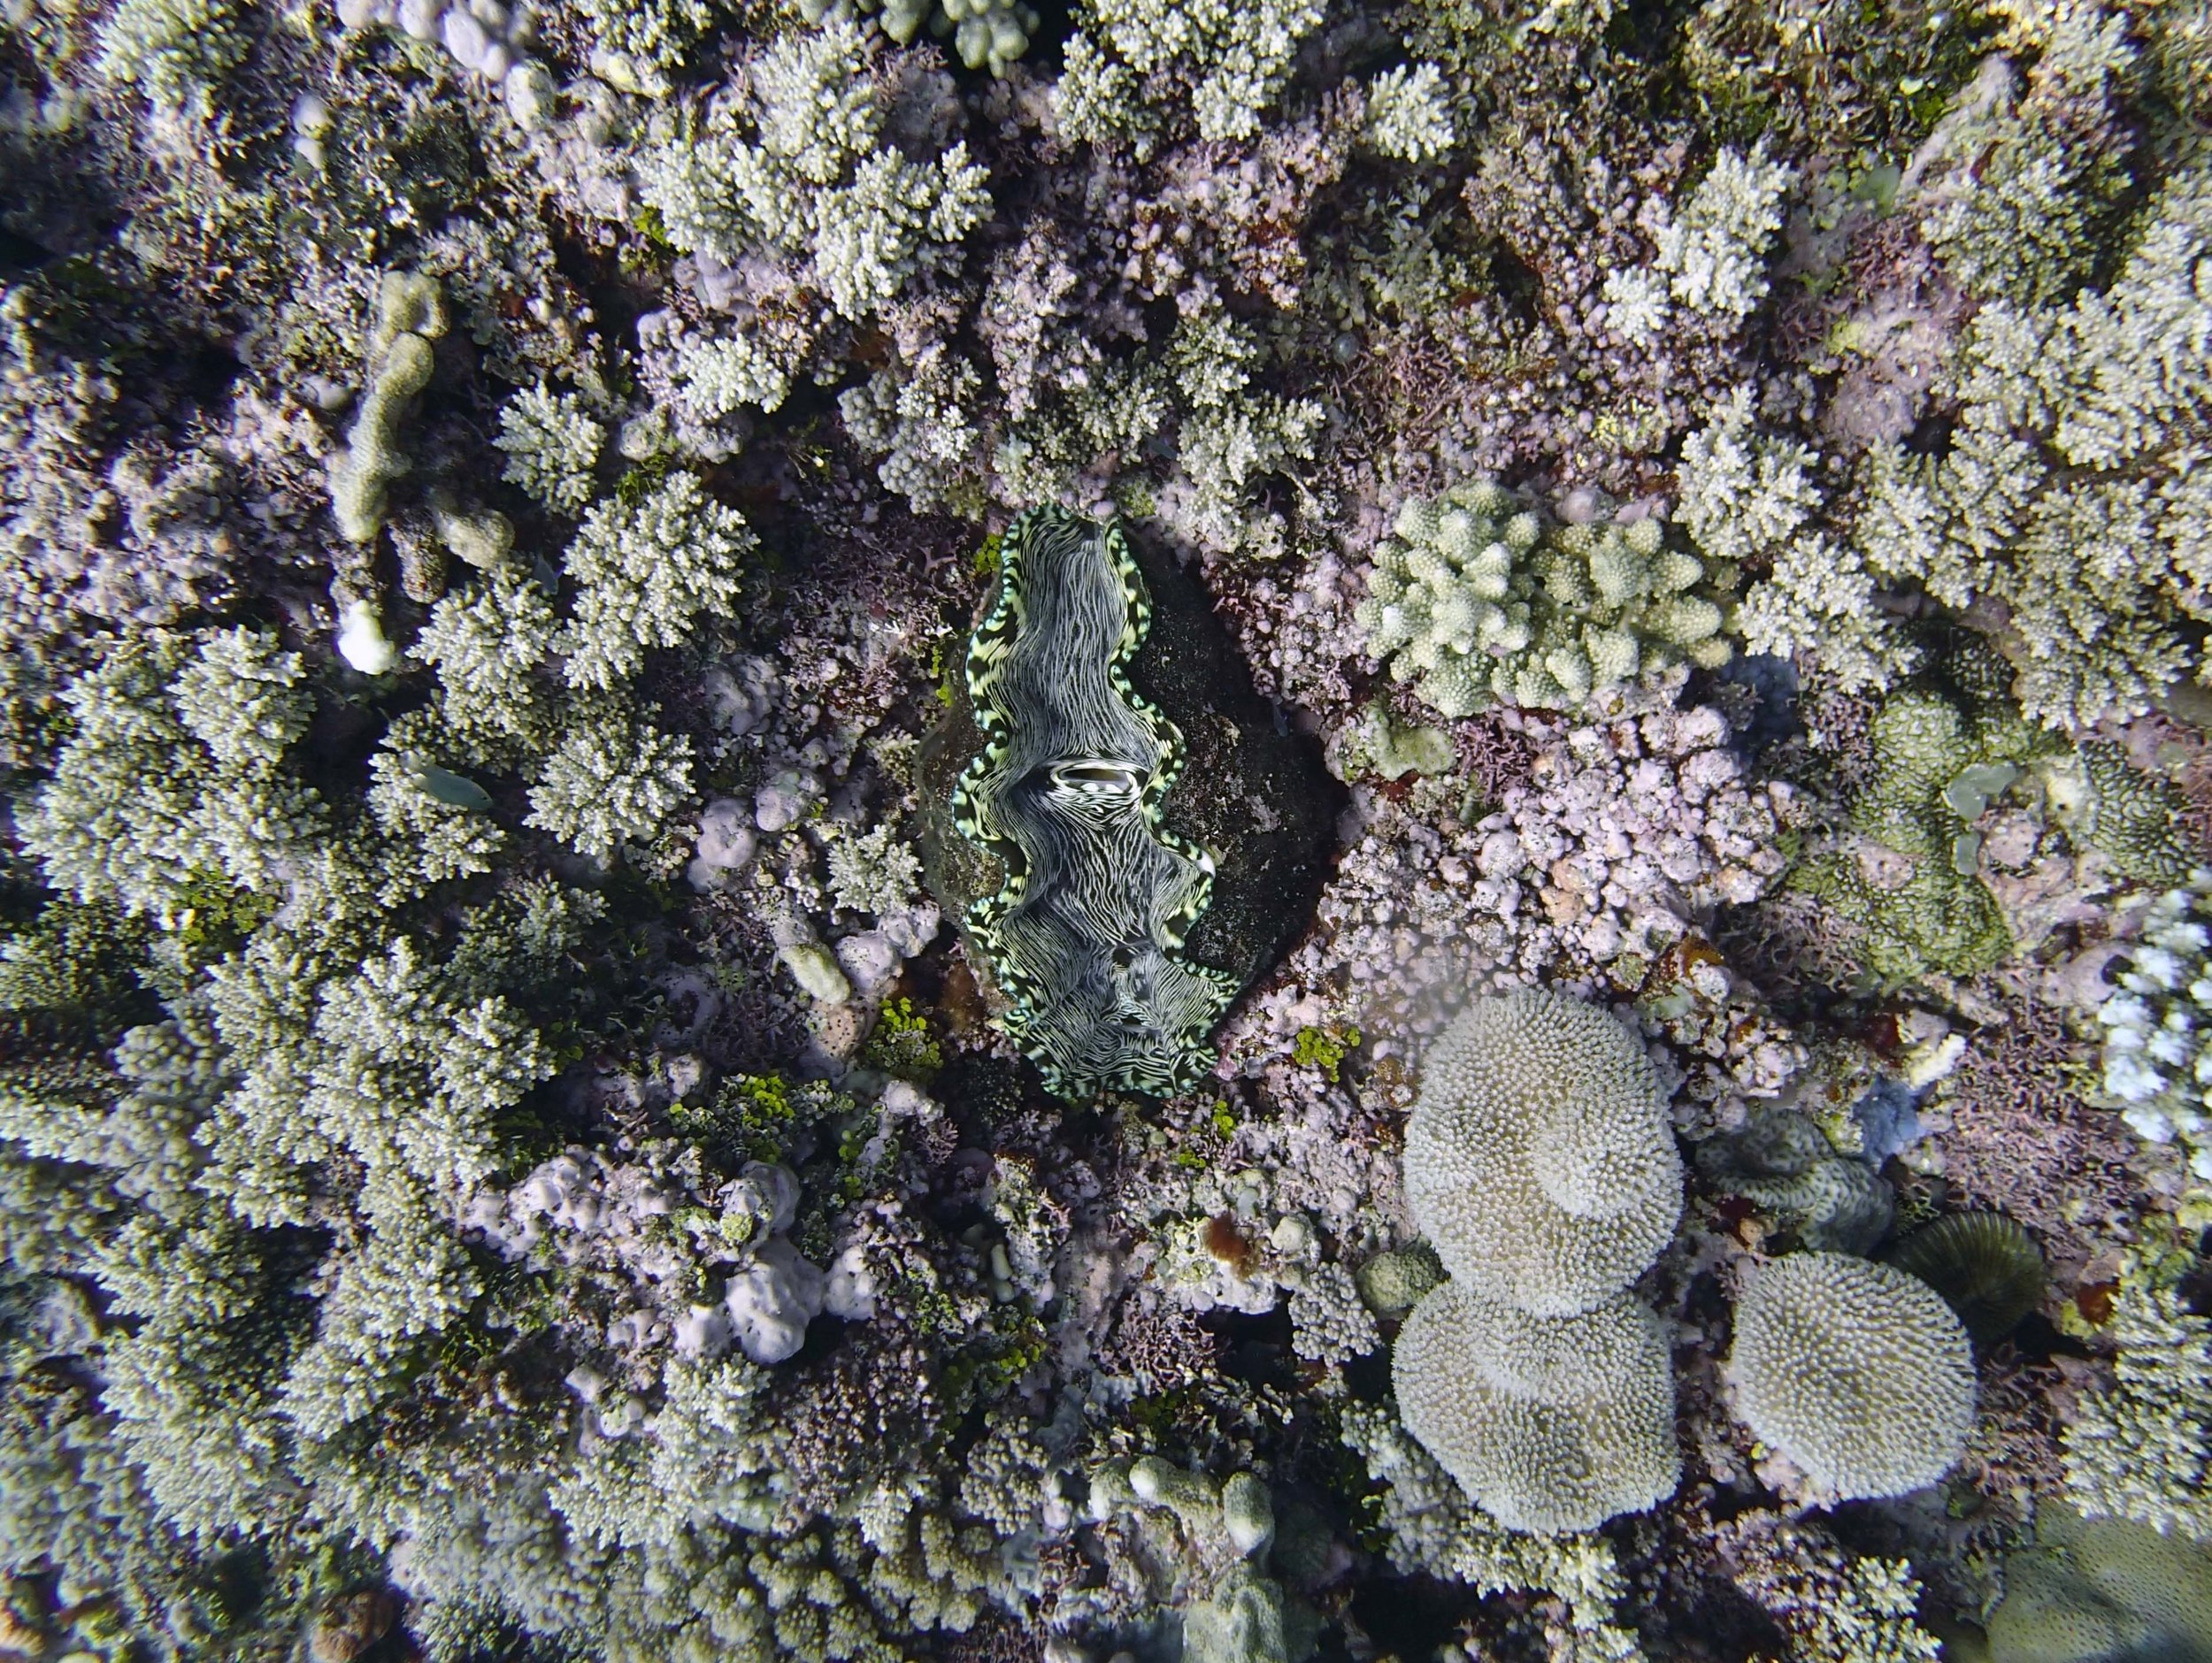 giant clam 2.jpg